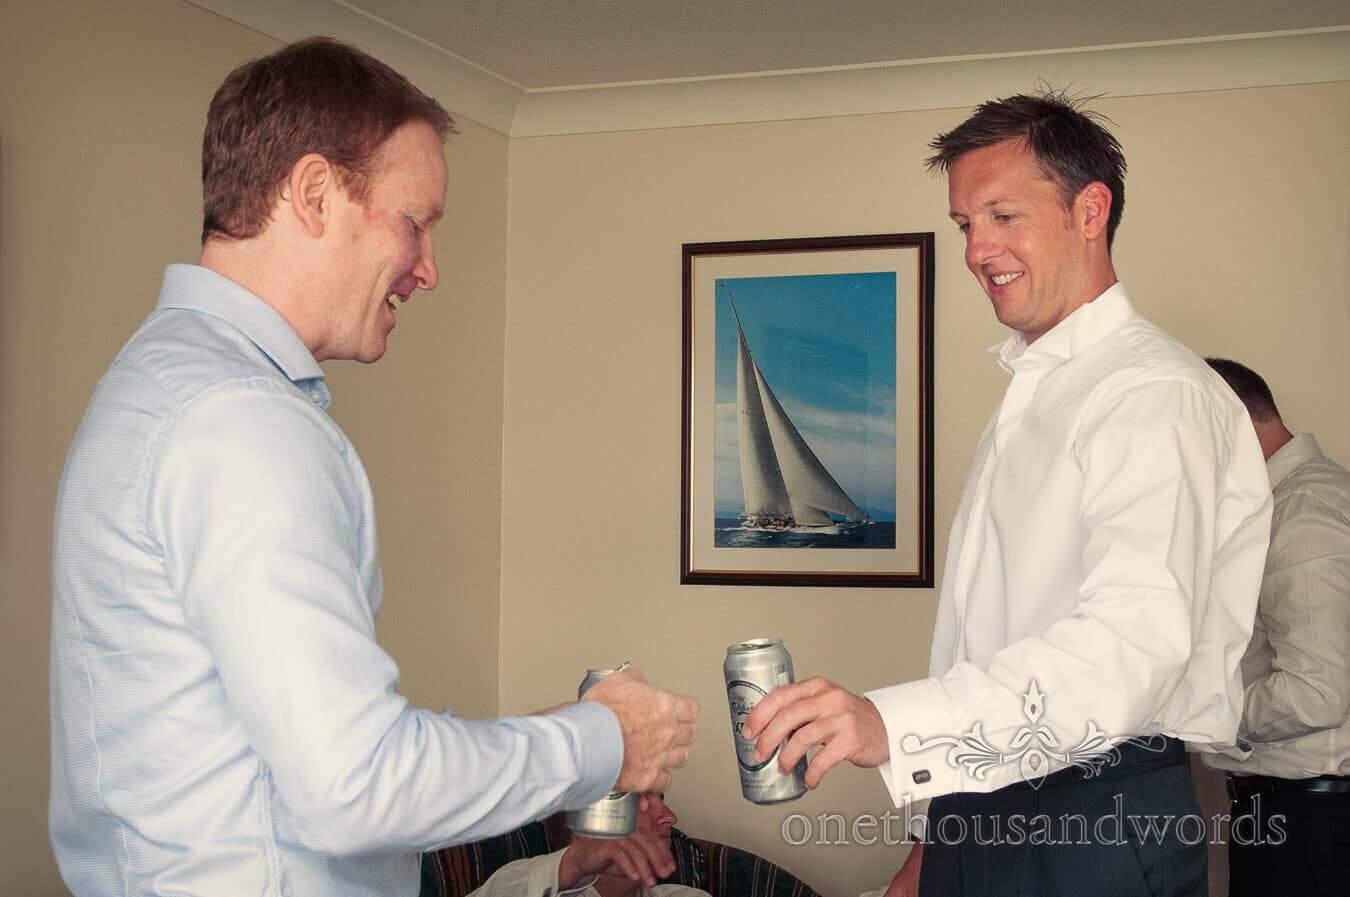 Groom and groomsman share a beer on wedding morning